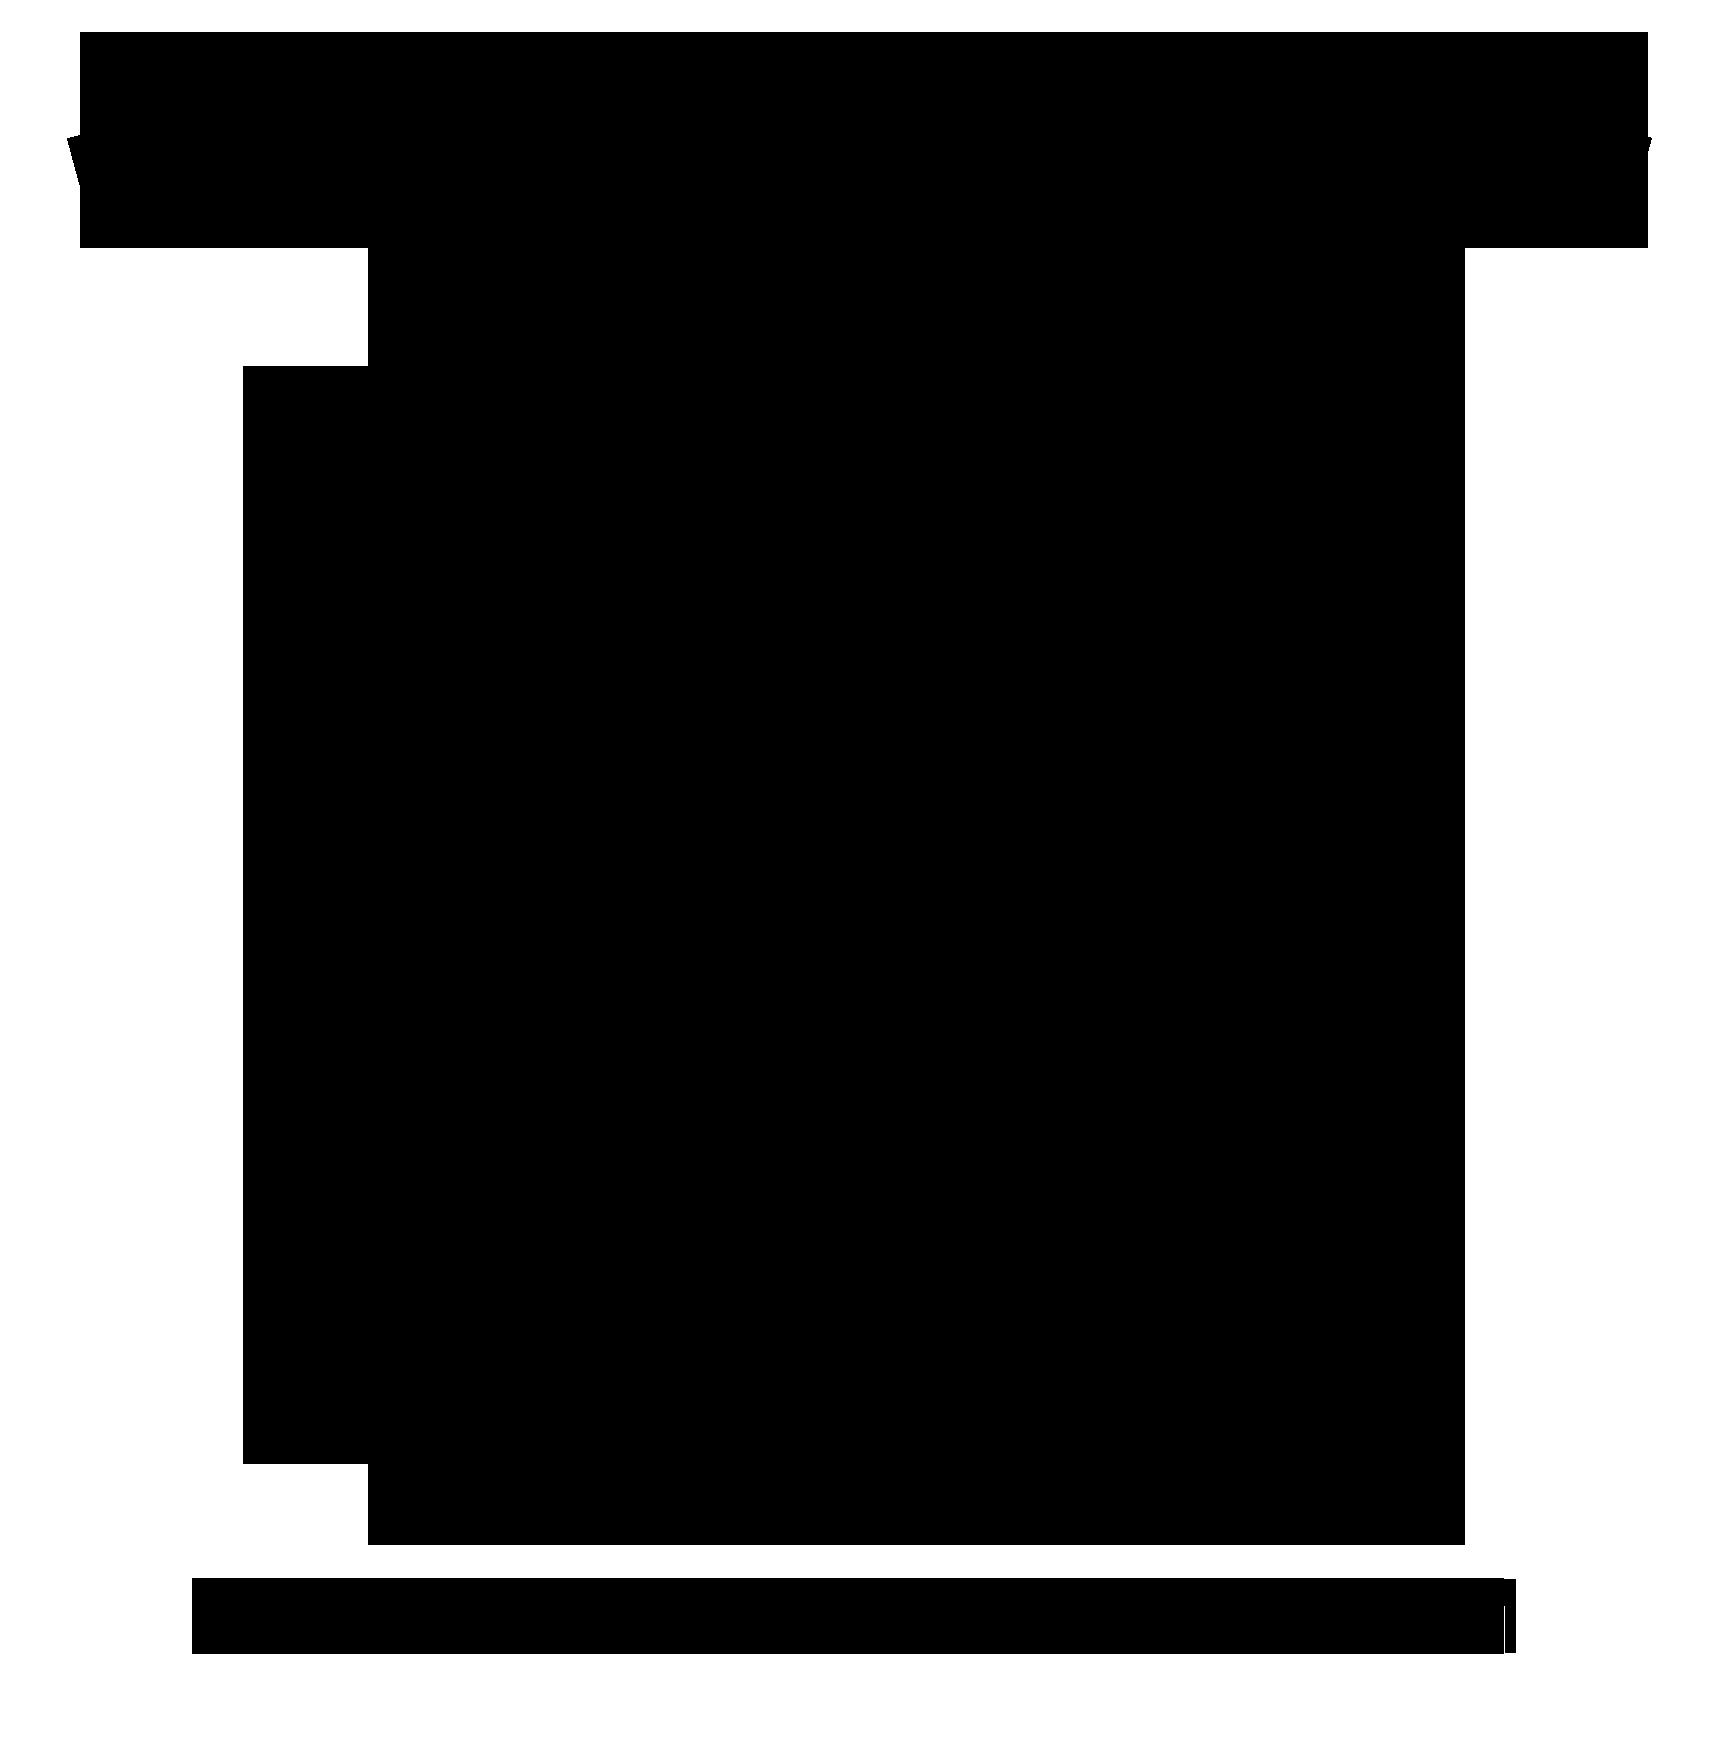 Msclogoblack